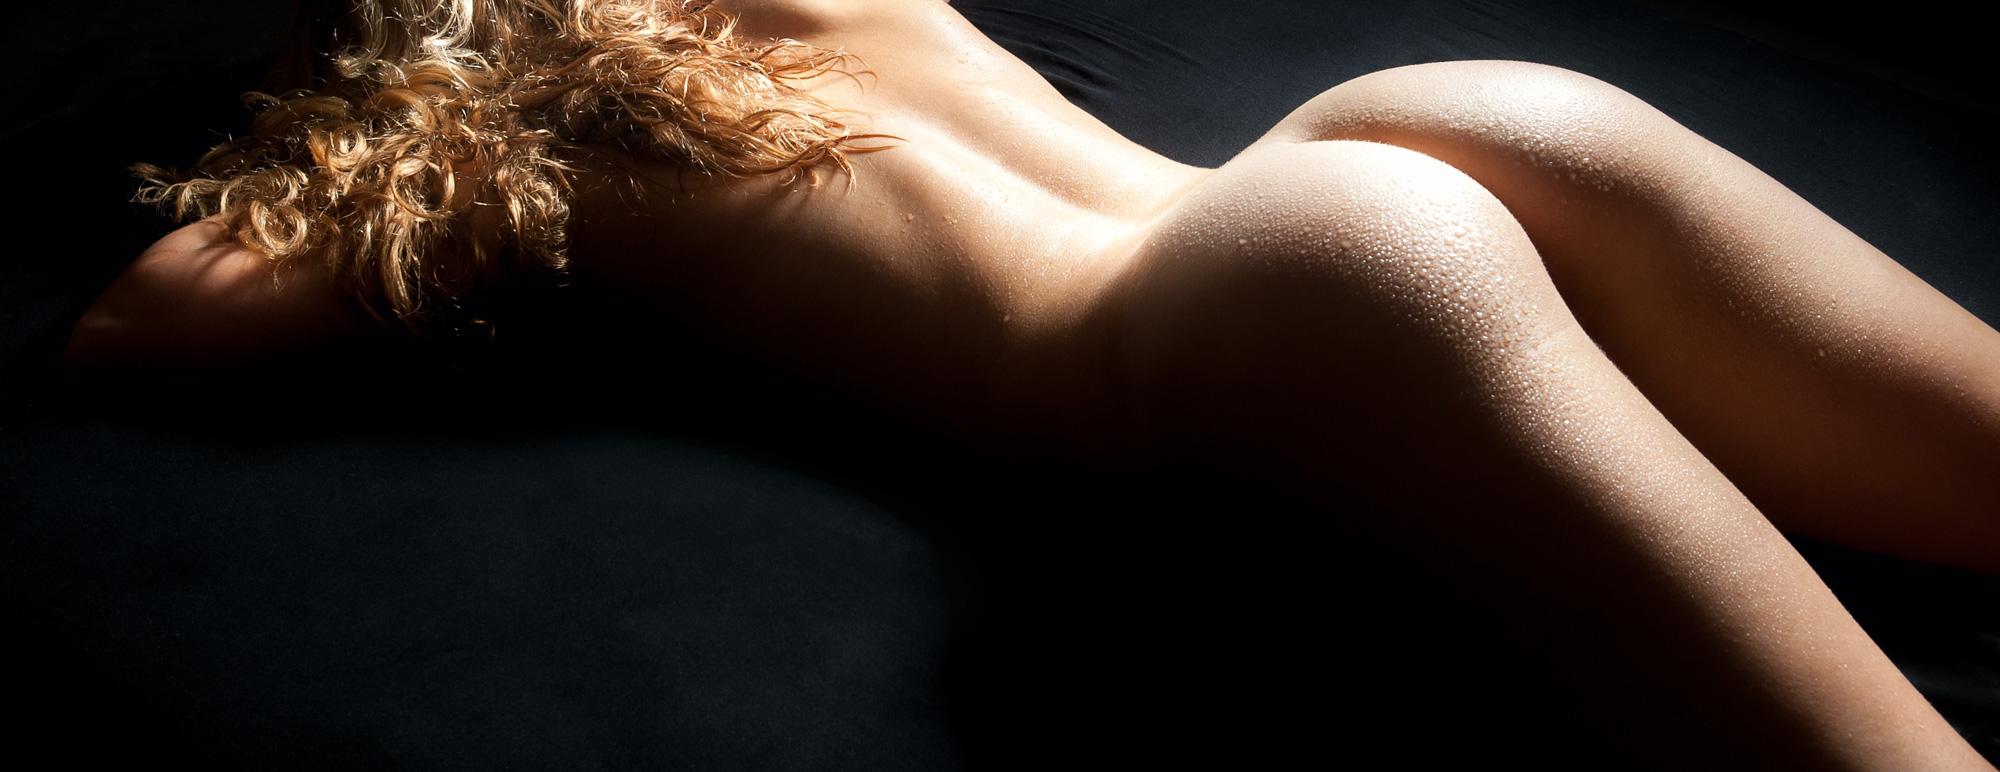 Buttock Augmentation - Dr Tim